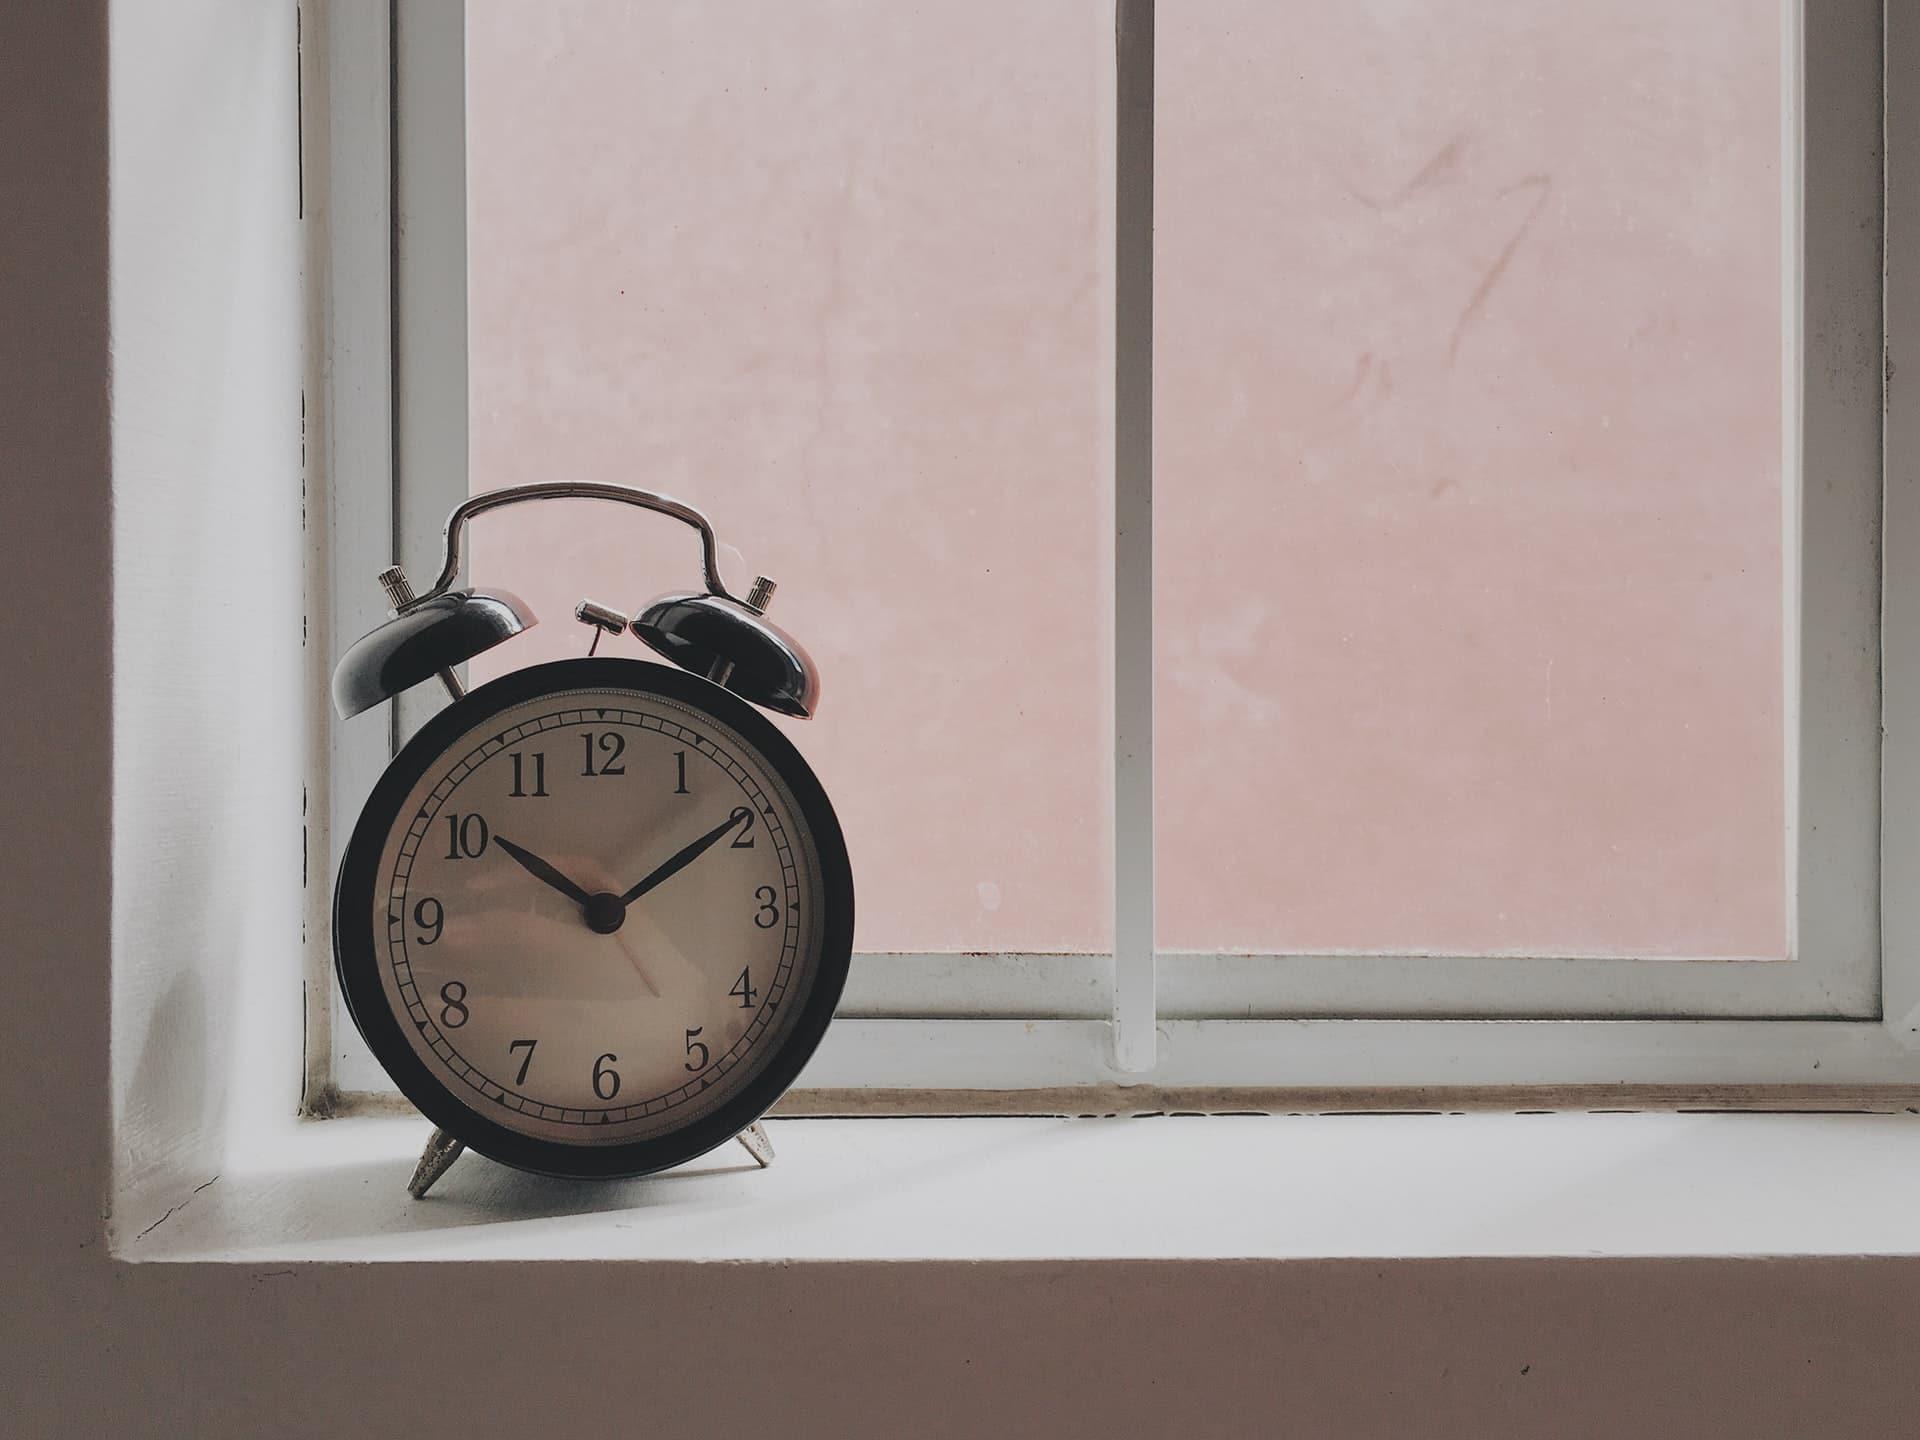 do men and women need different amounts of sleep?